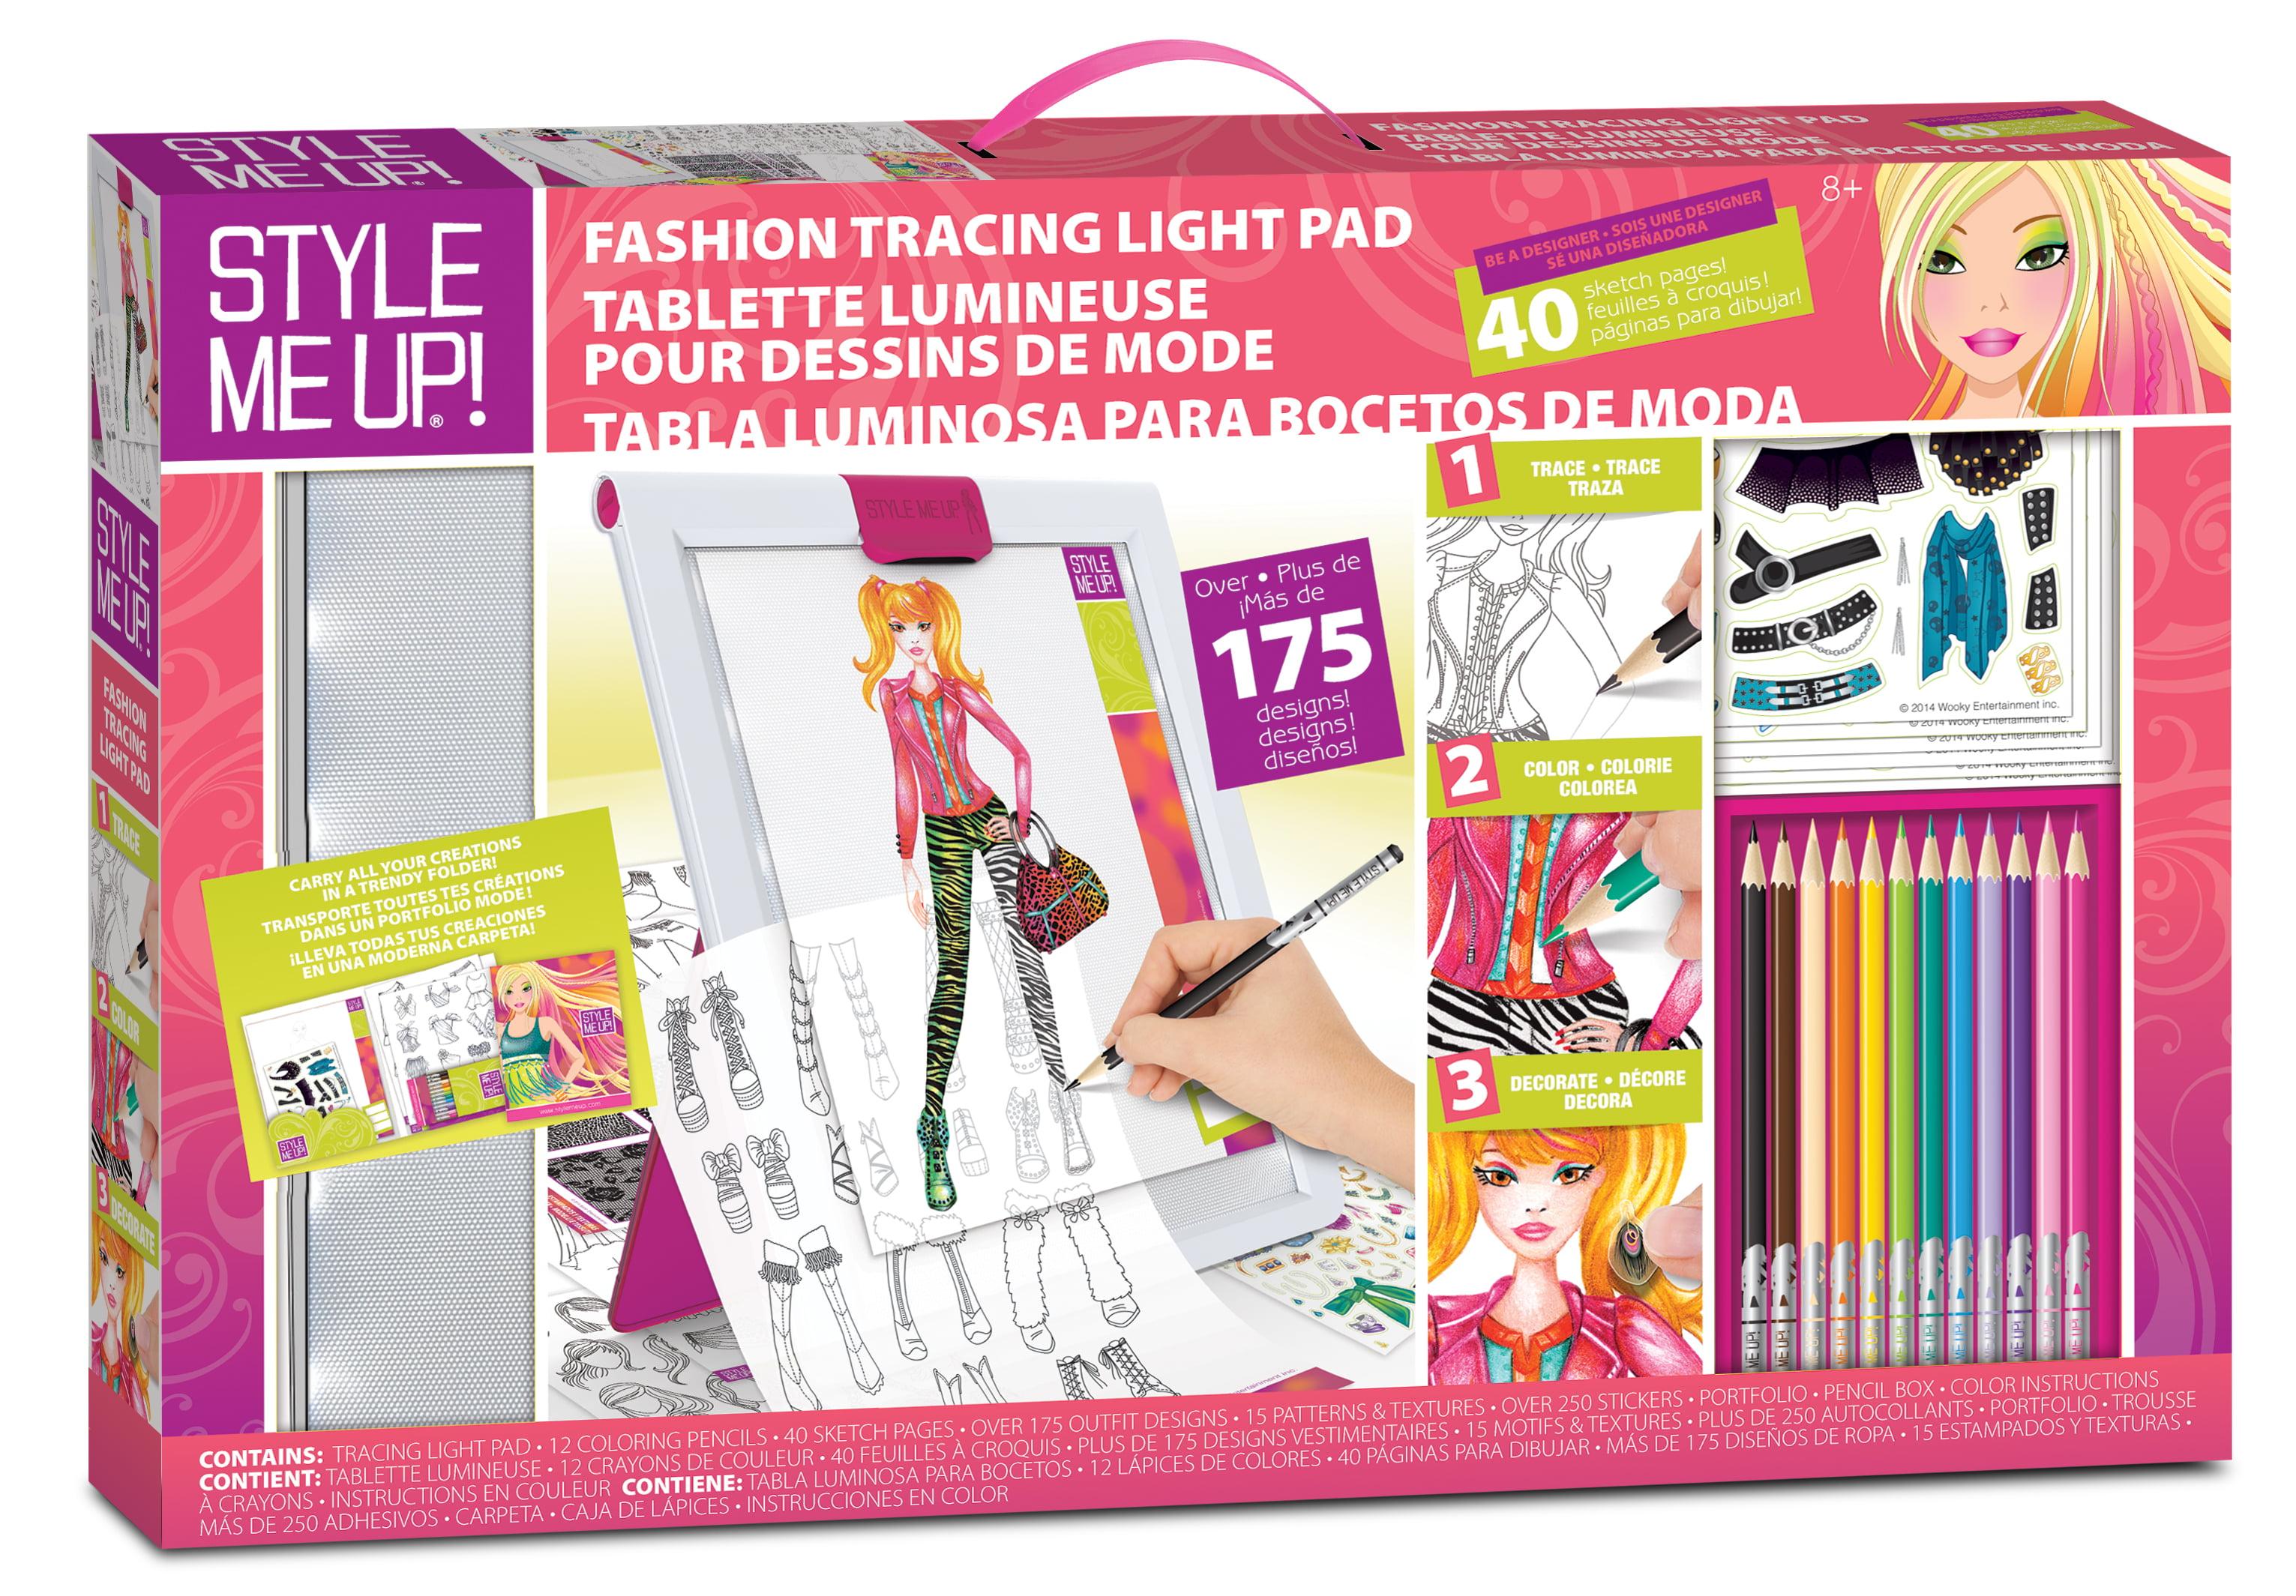 Style Me Up Fashion Tracing Light Pad Walmart Com Walmart Com